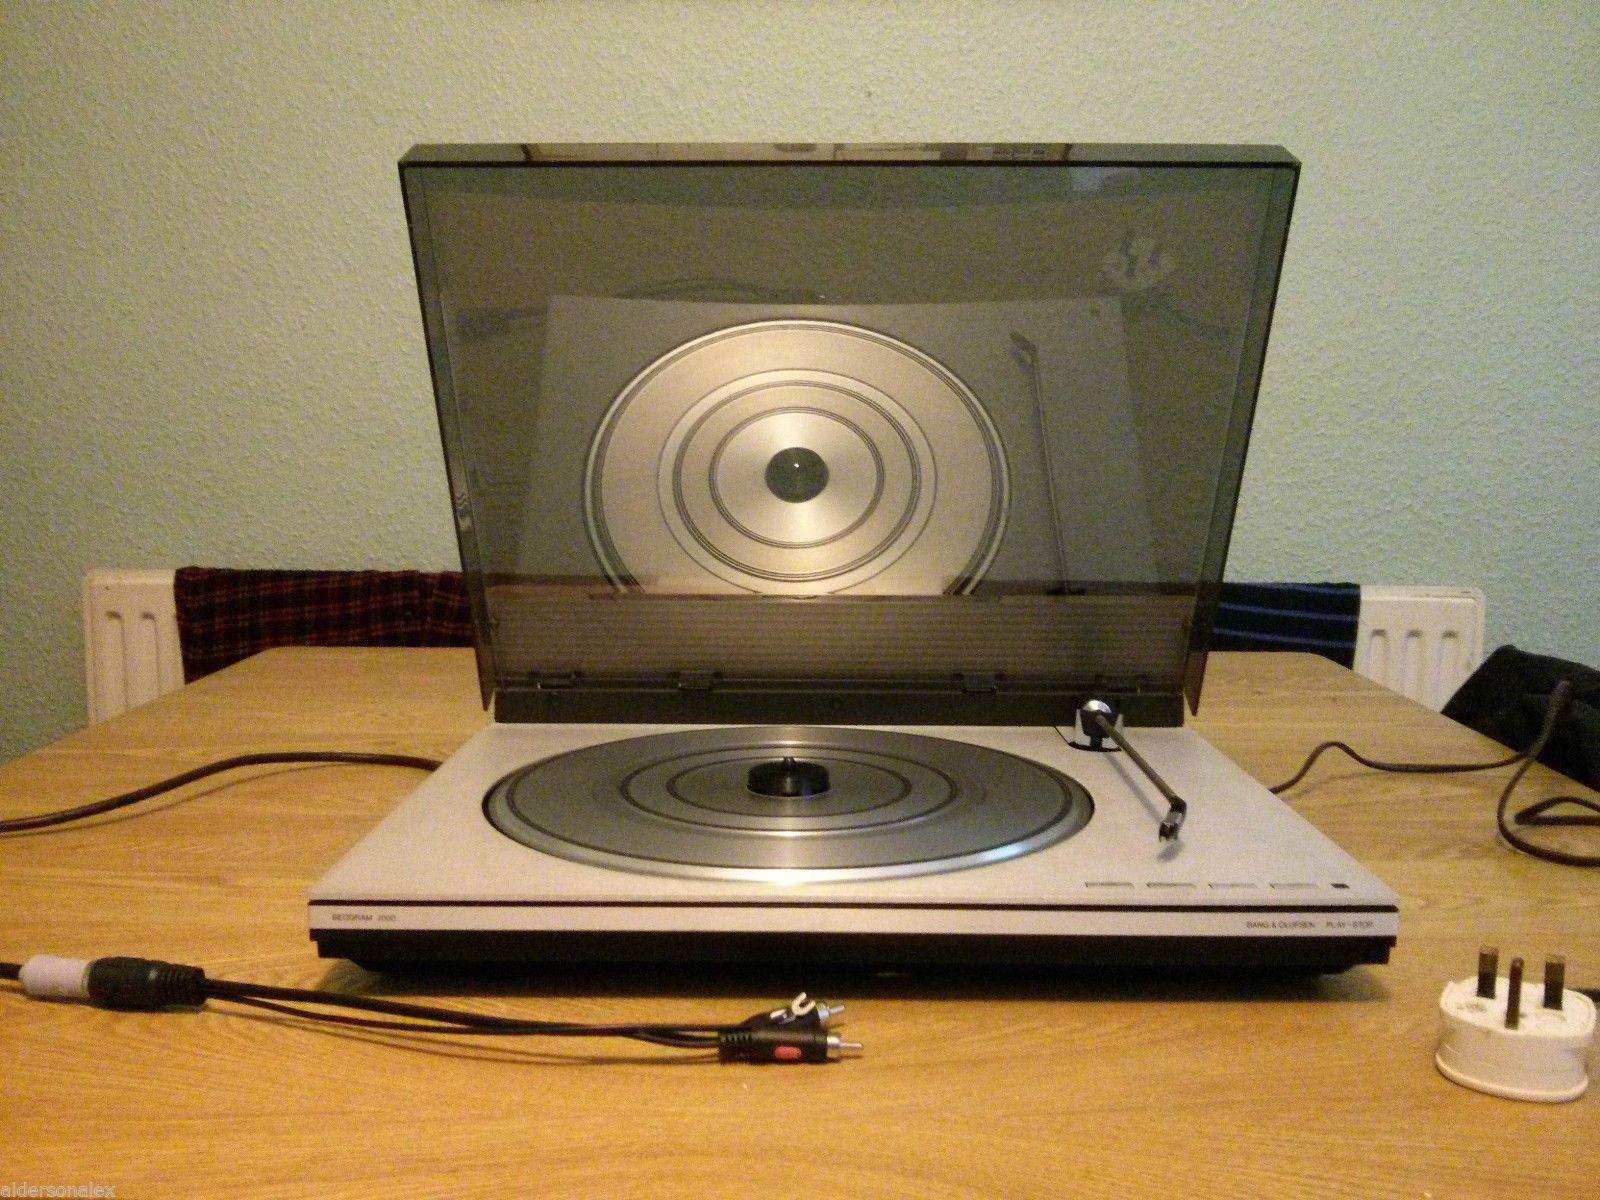 Bang & Olufsen Beogram 2000 Turntable Record Player Vinyl Deck